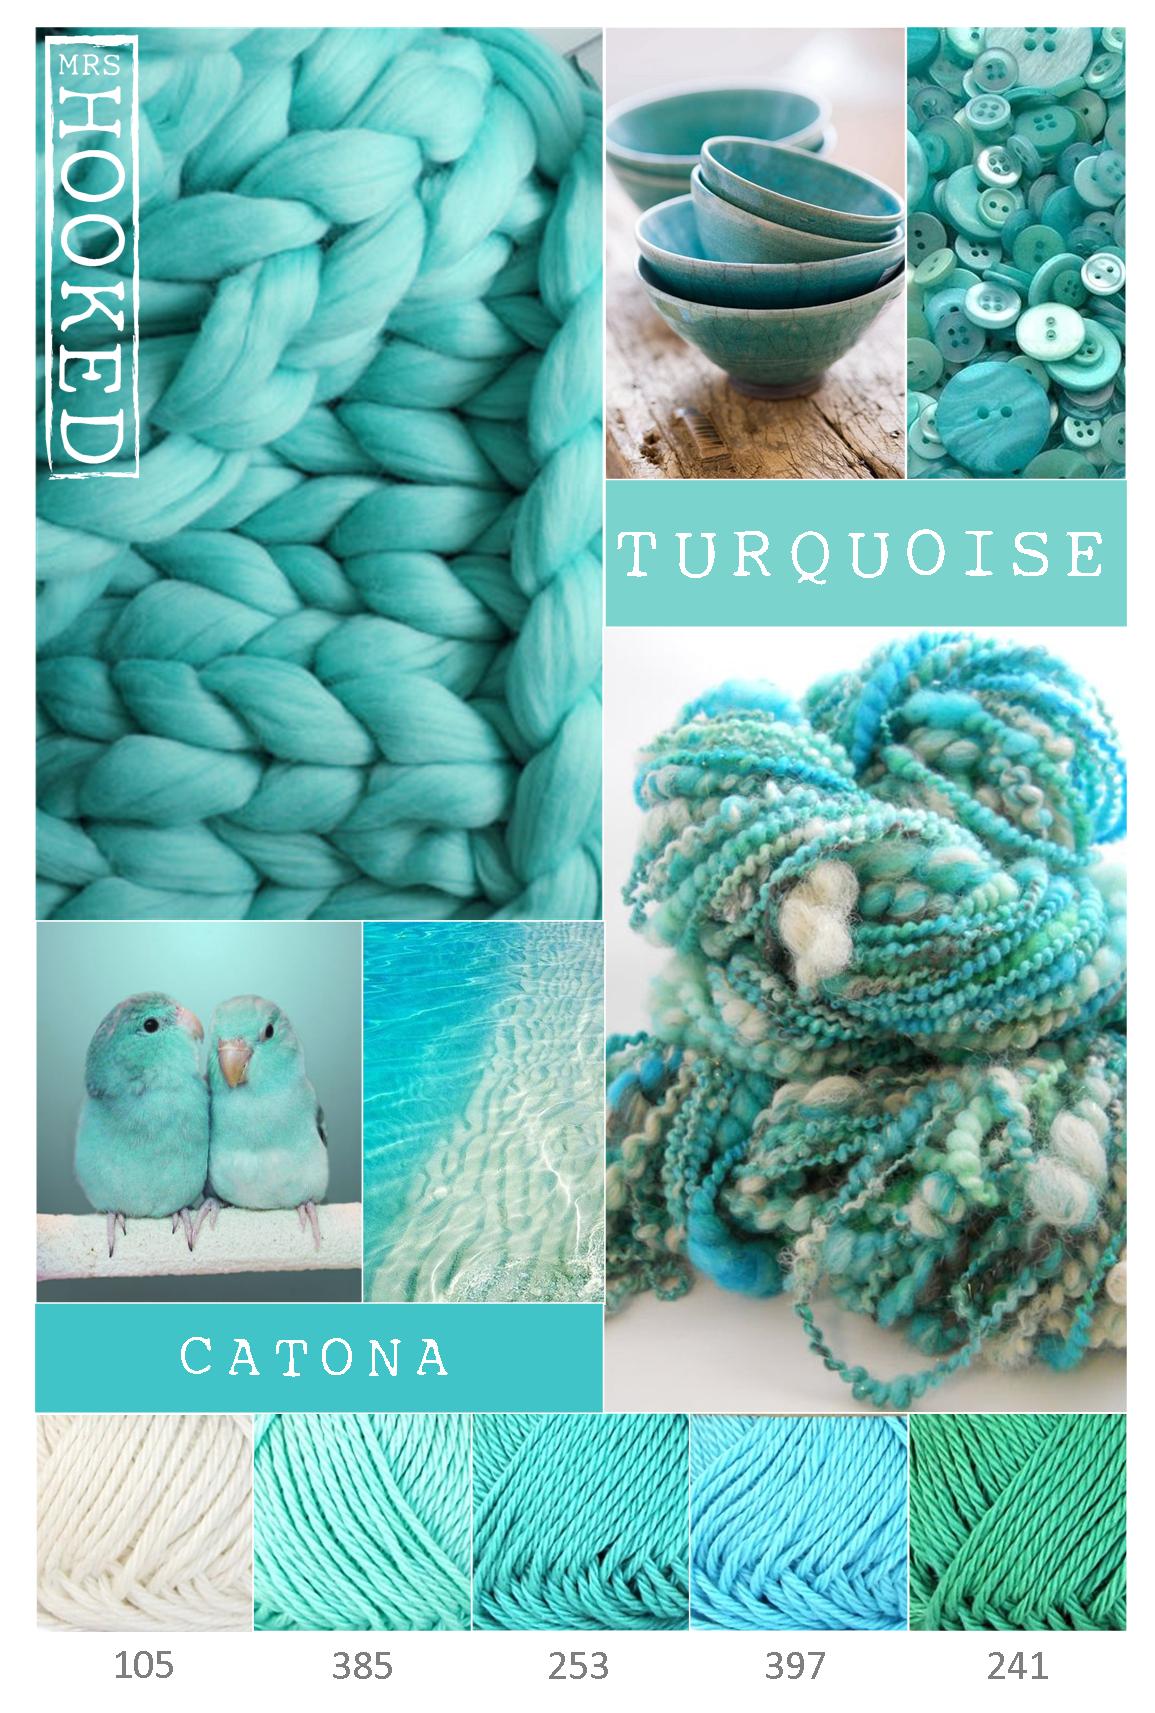 Turquoise - Kleurinspiratie turquoise - Scheepjes Catona - Mrshooked  Blue ColorsTurquoise  Color SchemesColor ...